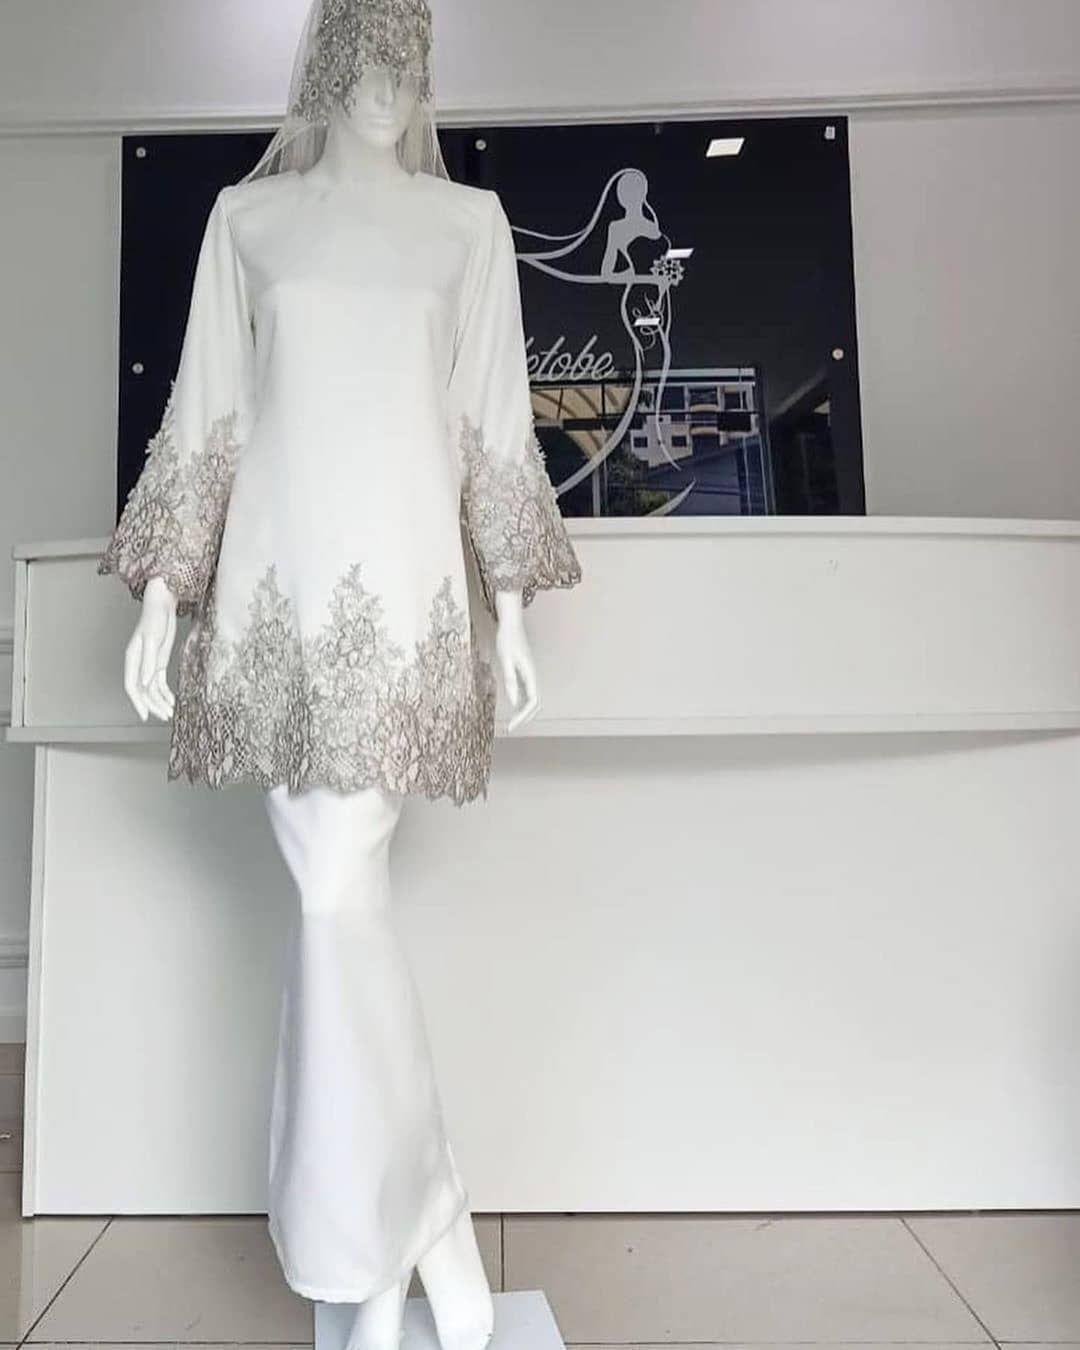 "baju nikah 👰 baju sanding on Instagram: ""ANTARA SEWAAN RM11 AKAD"